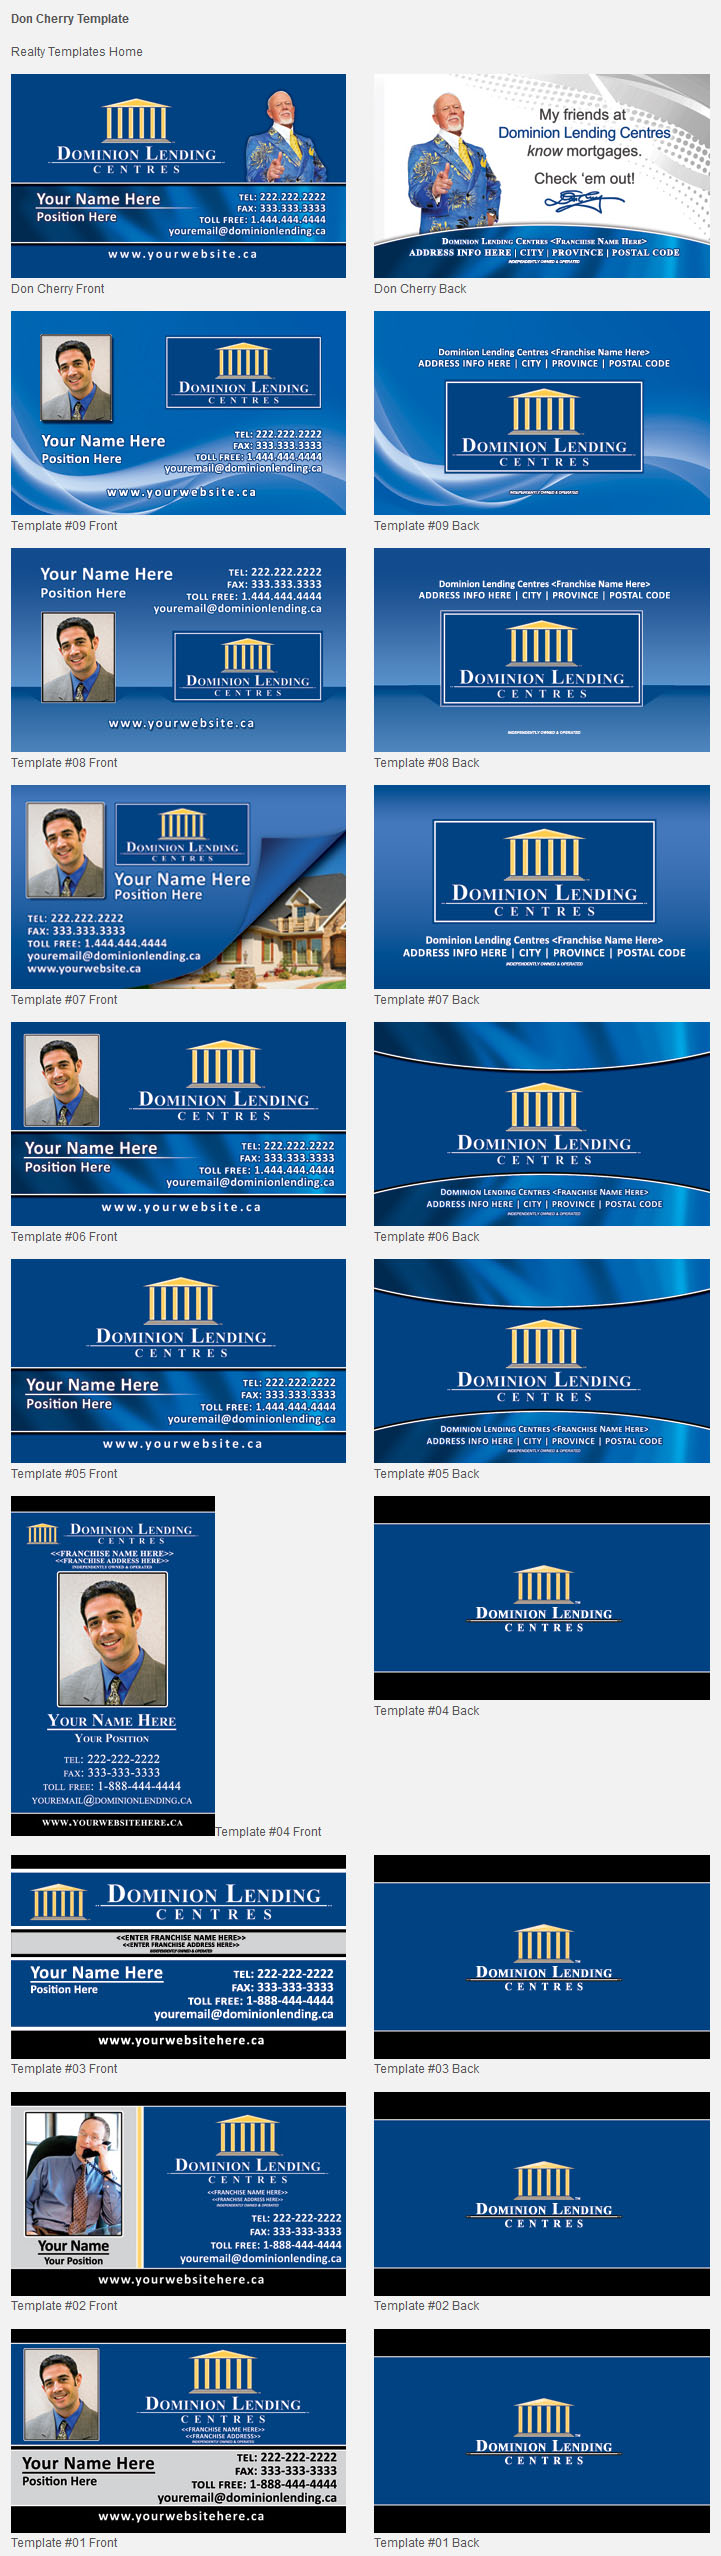 Dominion lending design templates unico print media specialty business cards maxwellsz